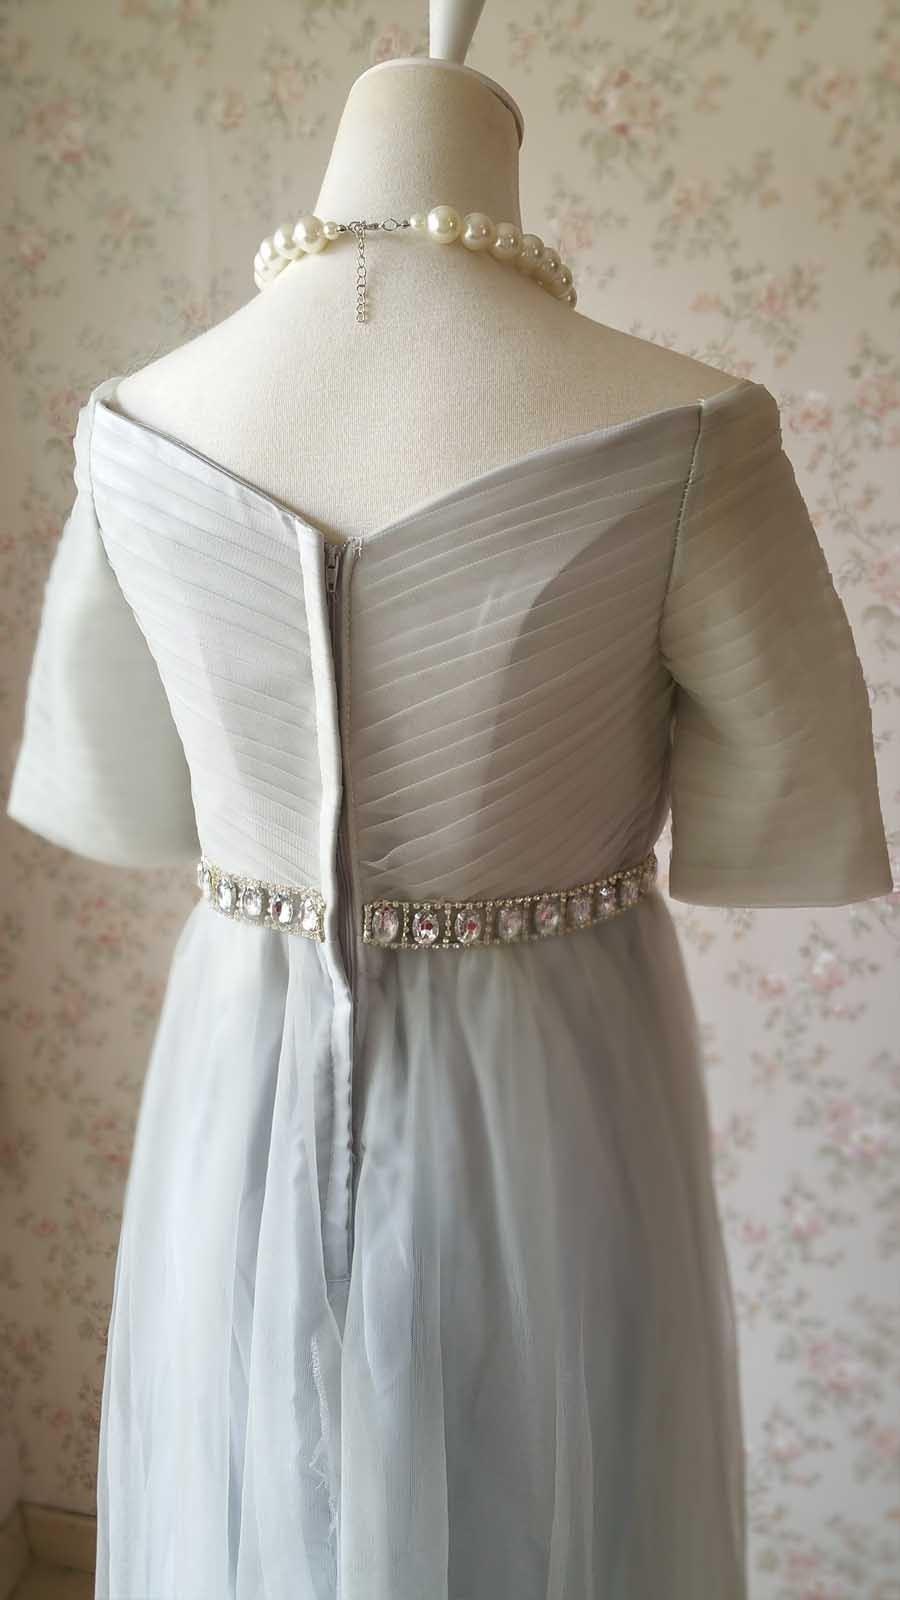 Light Gray Cap Sleeve Sweetheart Off Shoulder Floor Cocktail Dress Wedding Dress